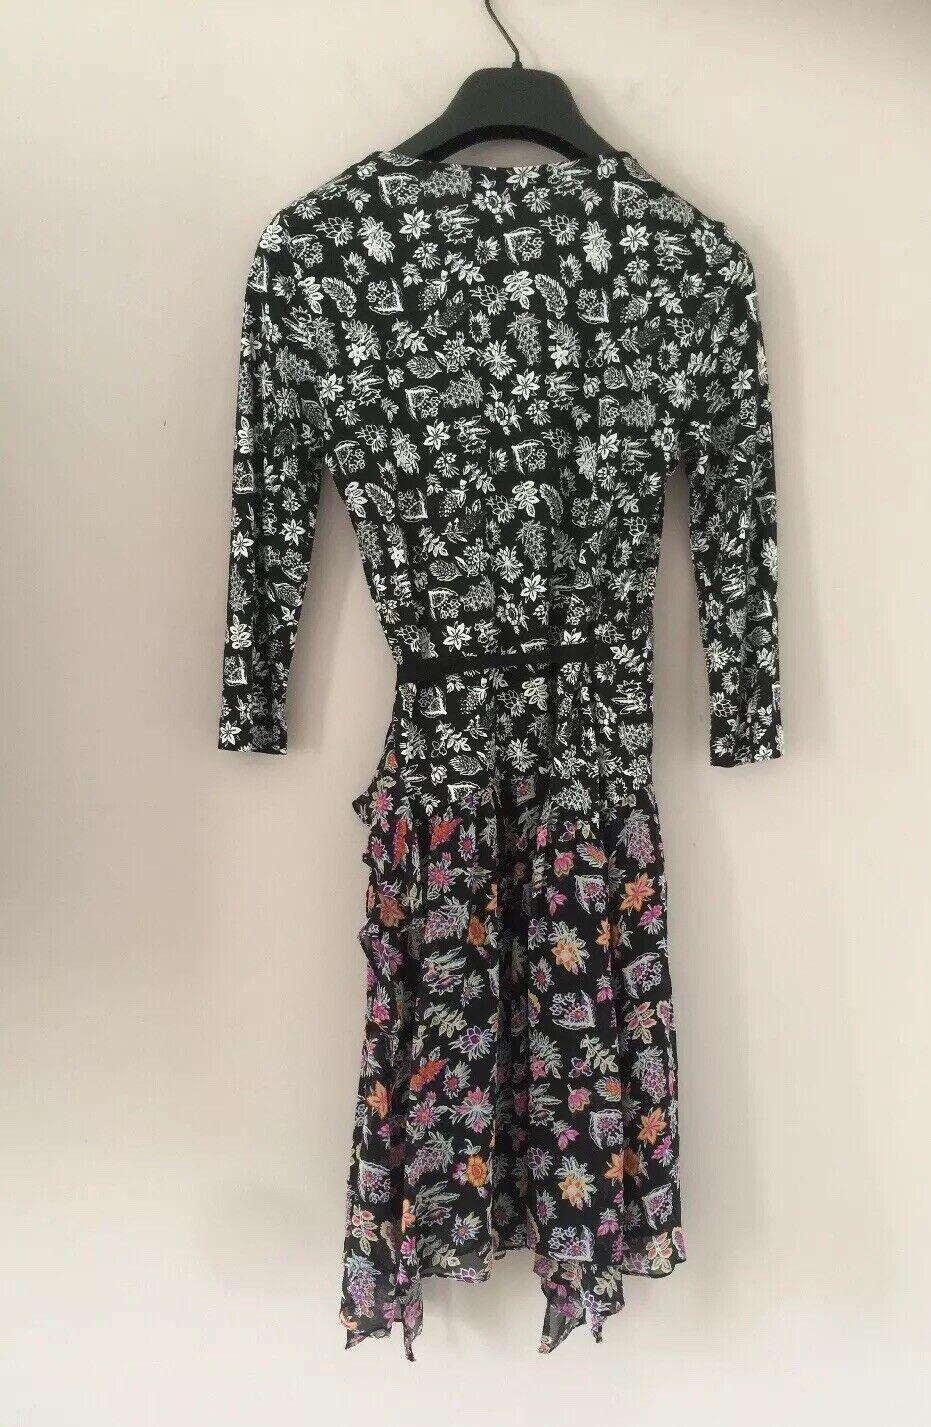 Dvf Dress - image 5